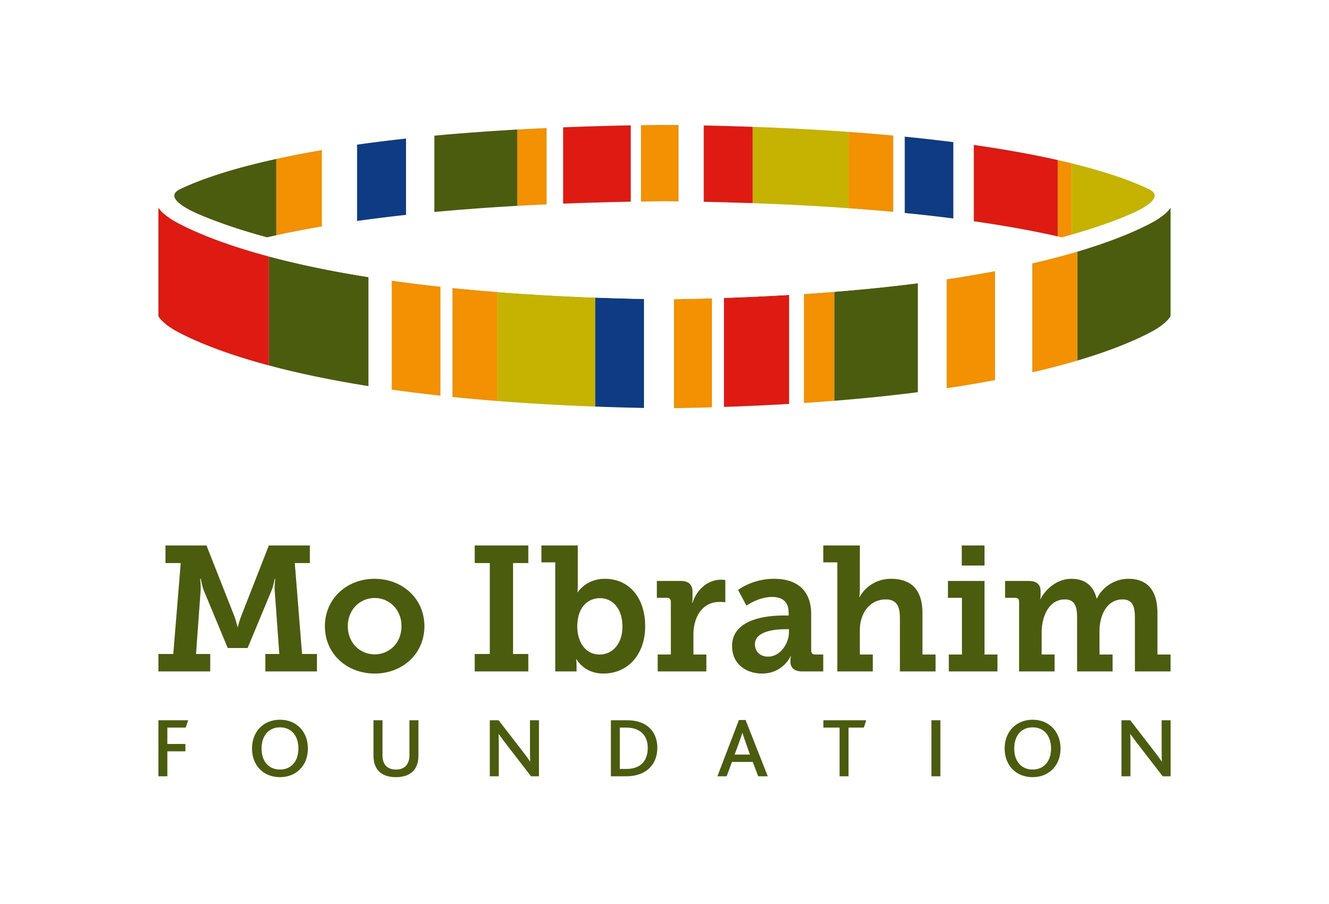 Mo Ibrahim Foundation GDAI PhD Scholarships 2020 at SOAS University of London (Fully-funded)